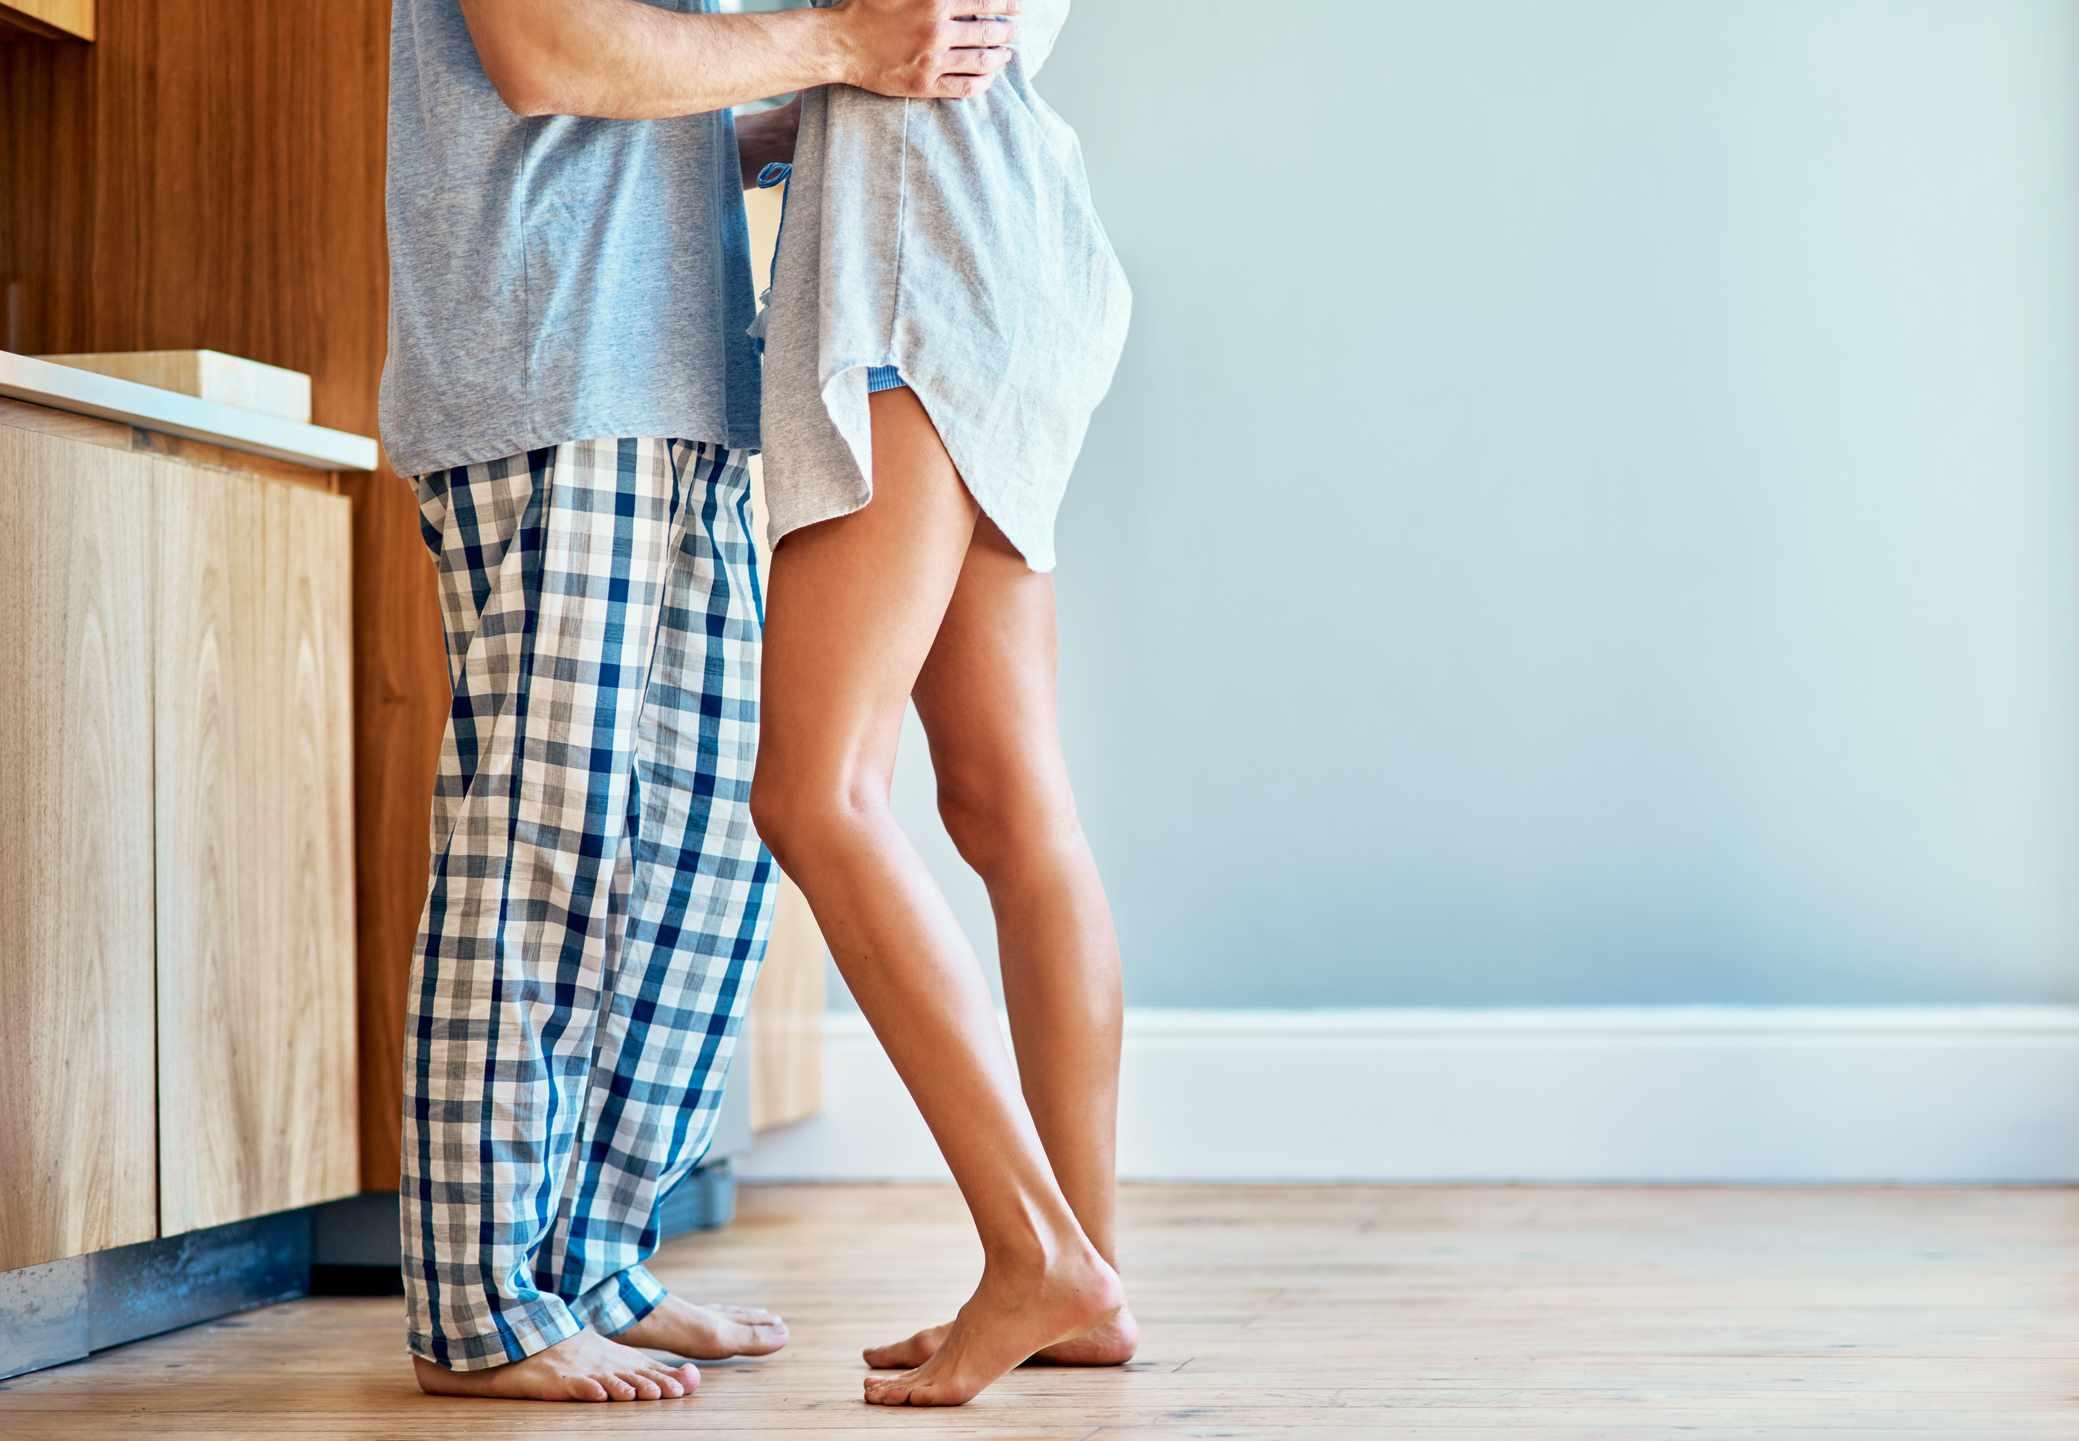 A Couple wearing pajamas at home